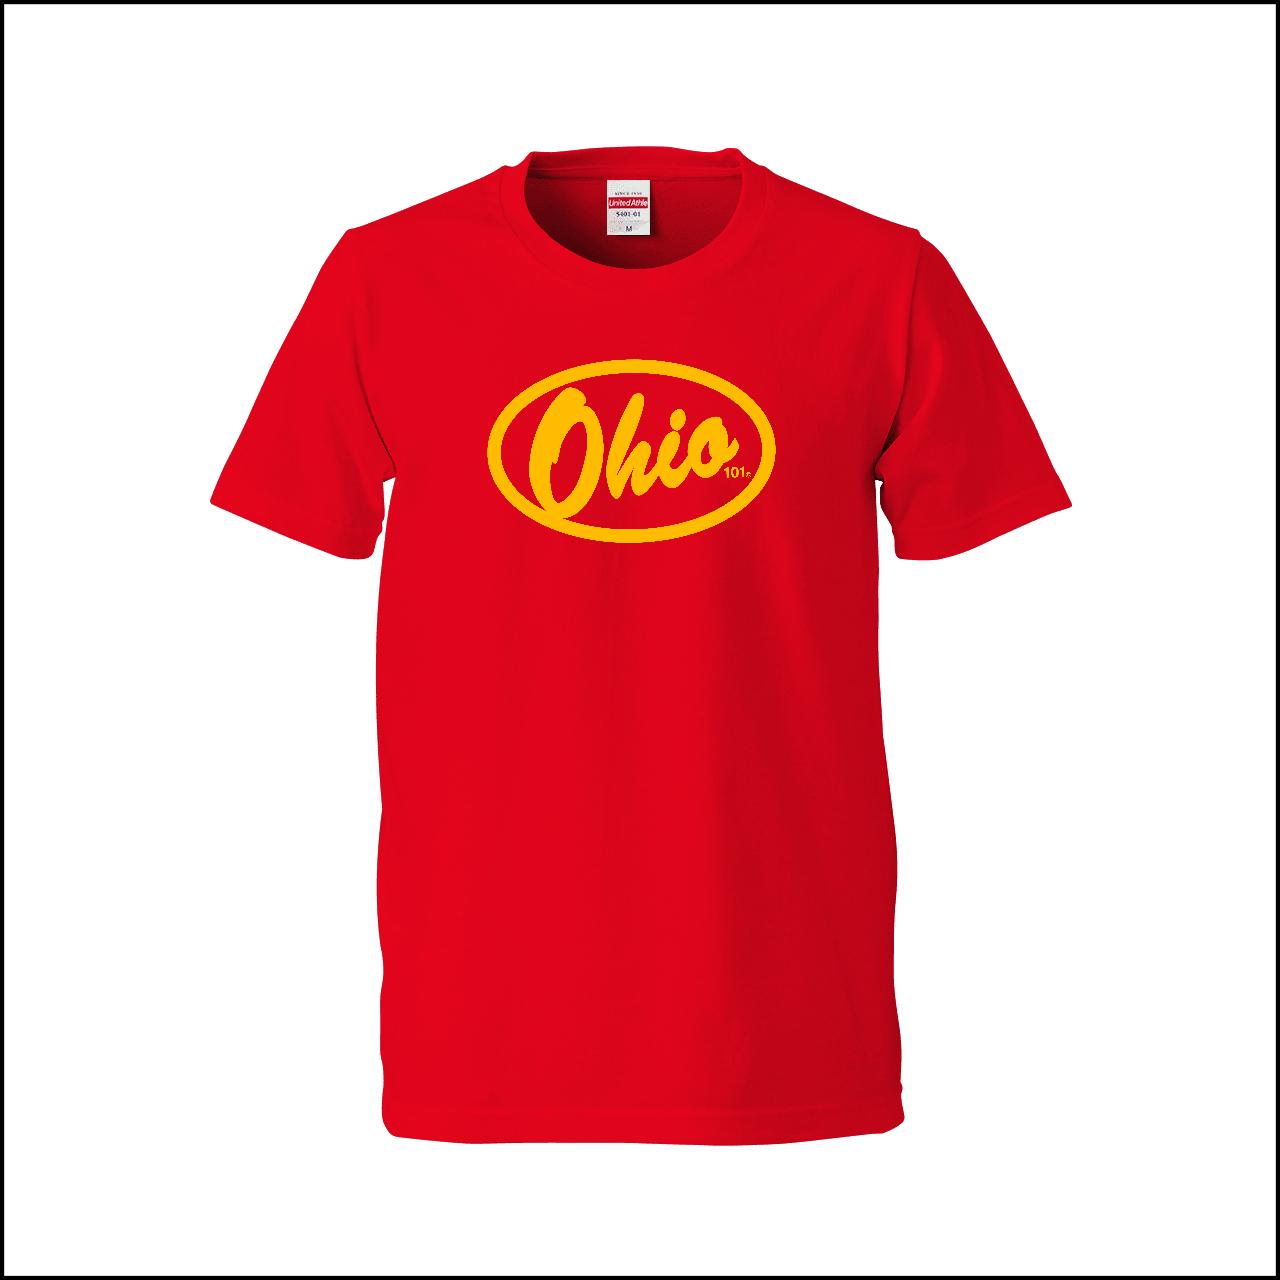 OHIO101 LOGO red × yellow